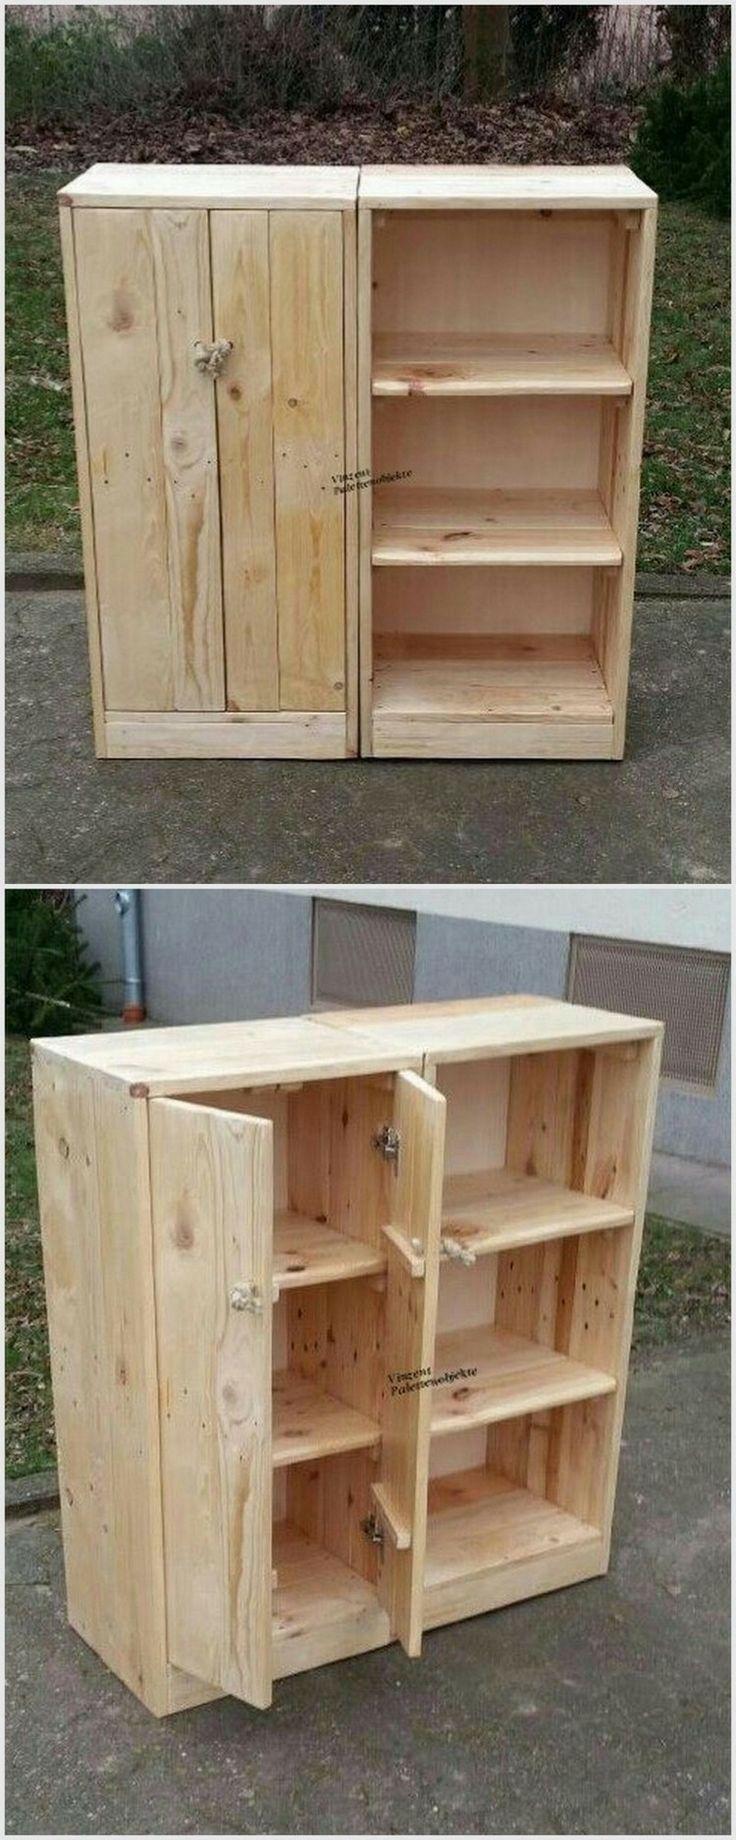 Would make a nice workshop cabinet.